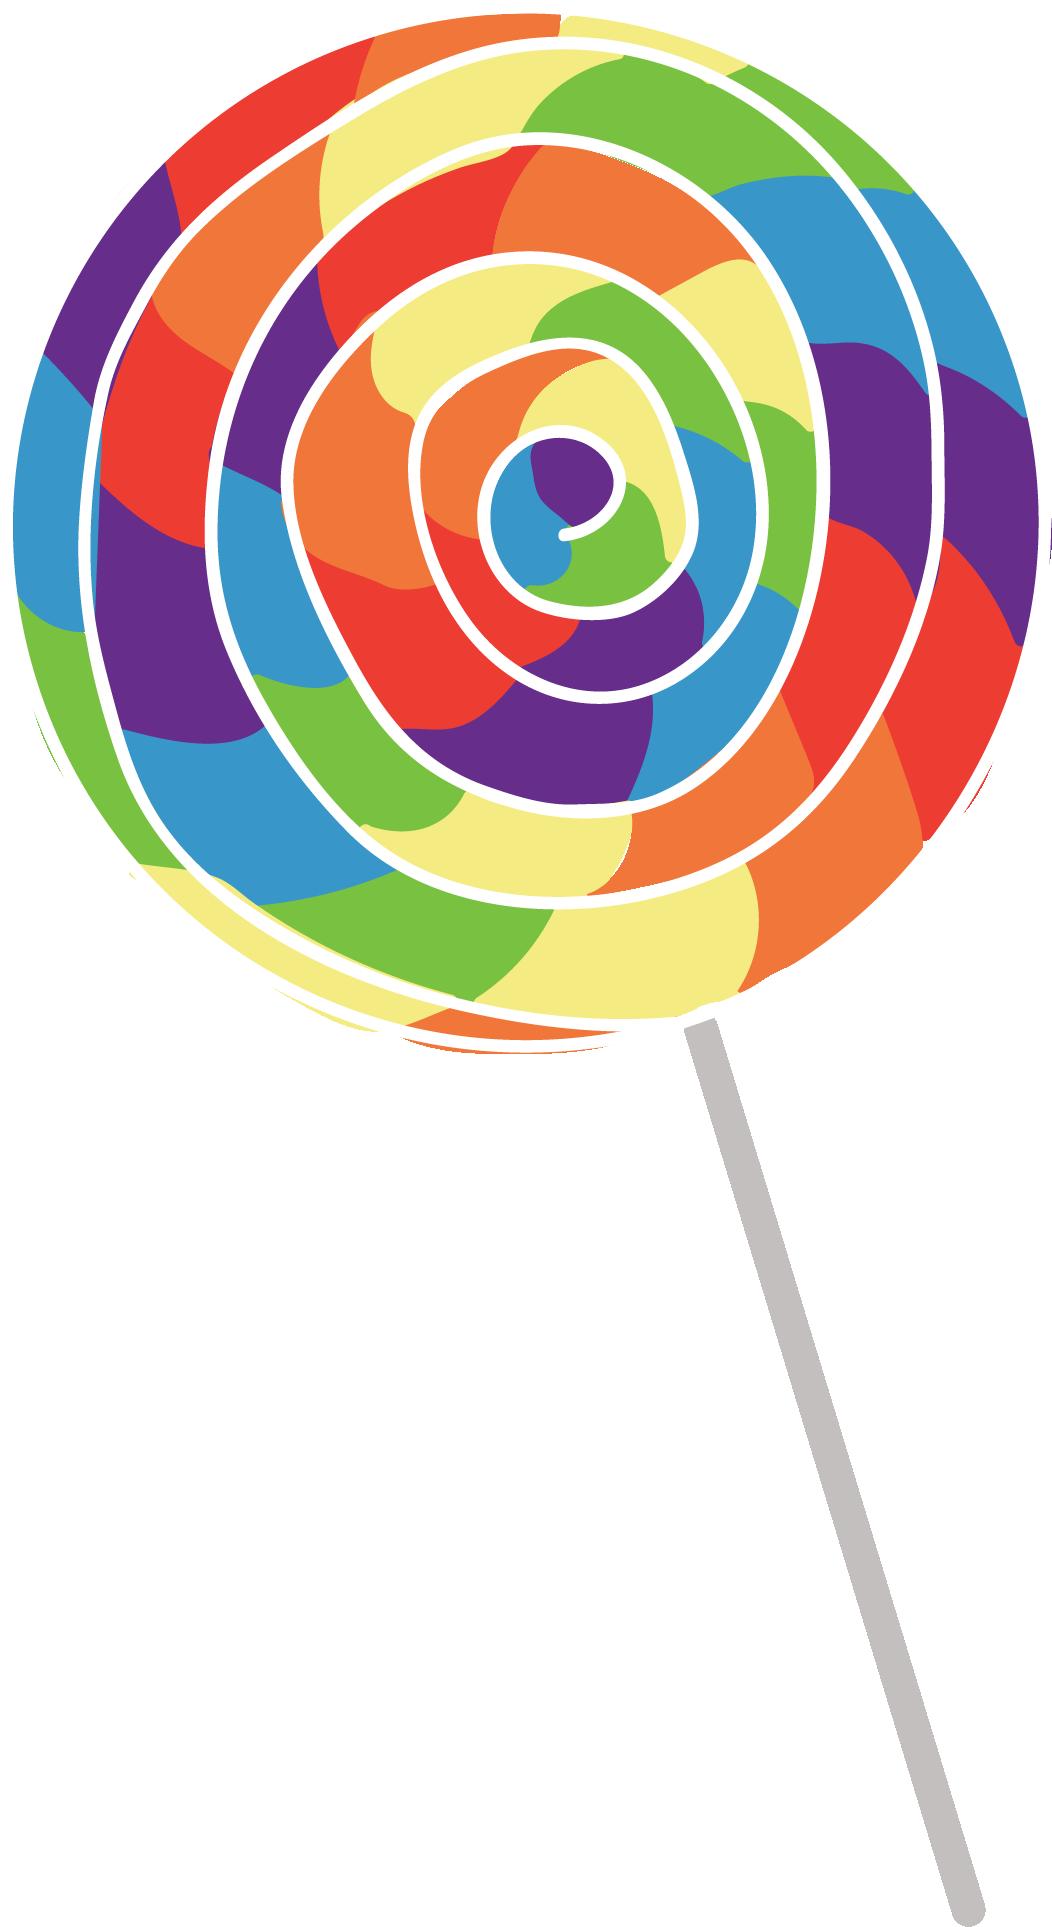 Rainbow Lollildpi.png